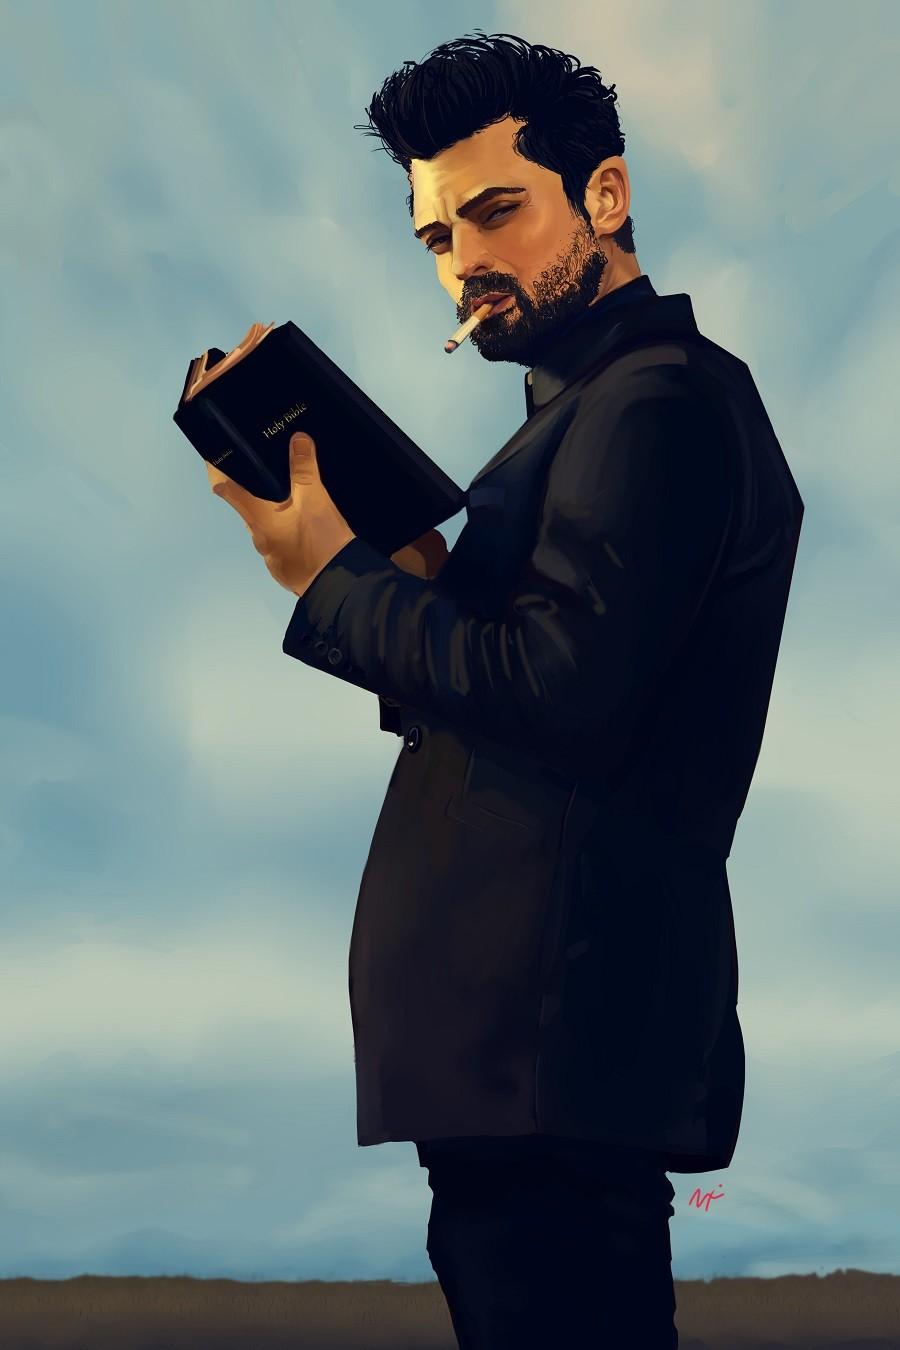 Jesse Custer - Preacher